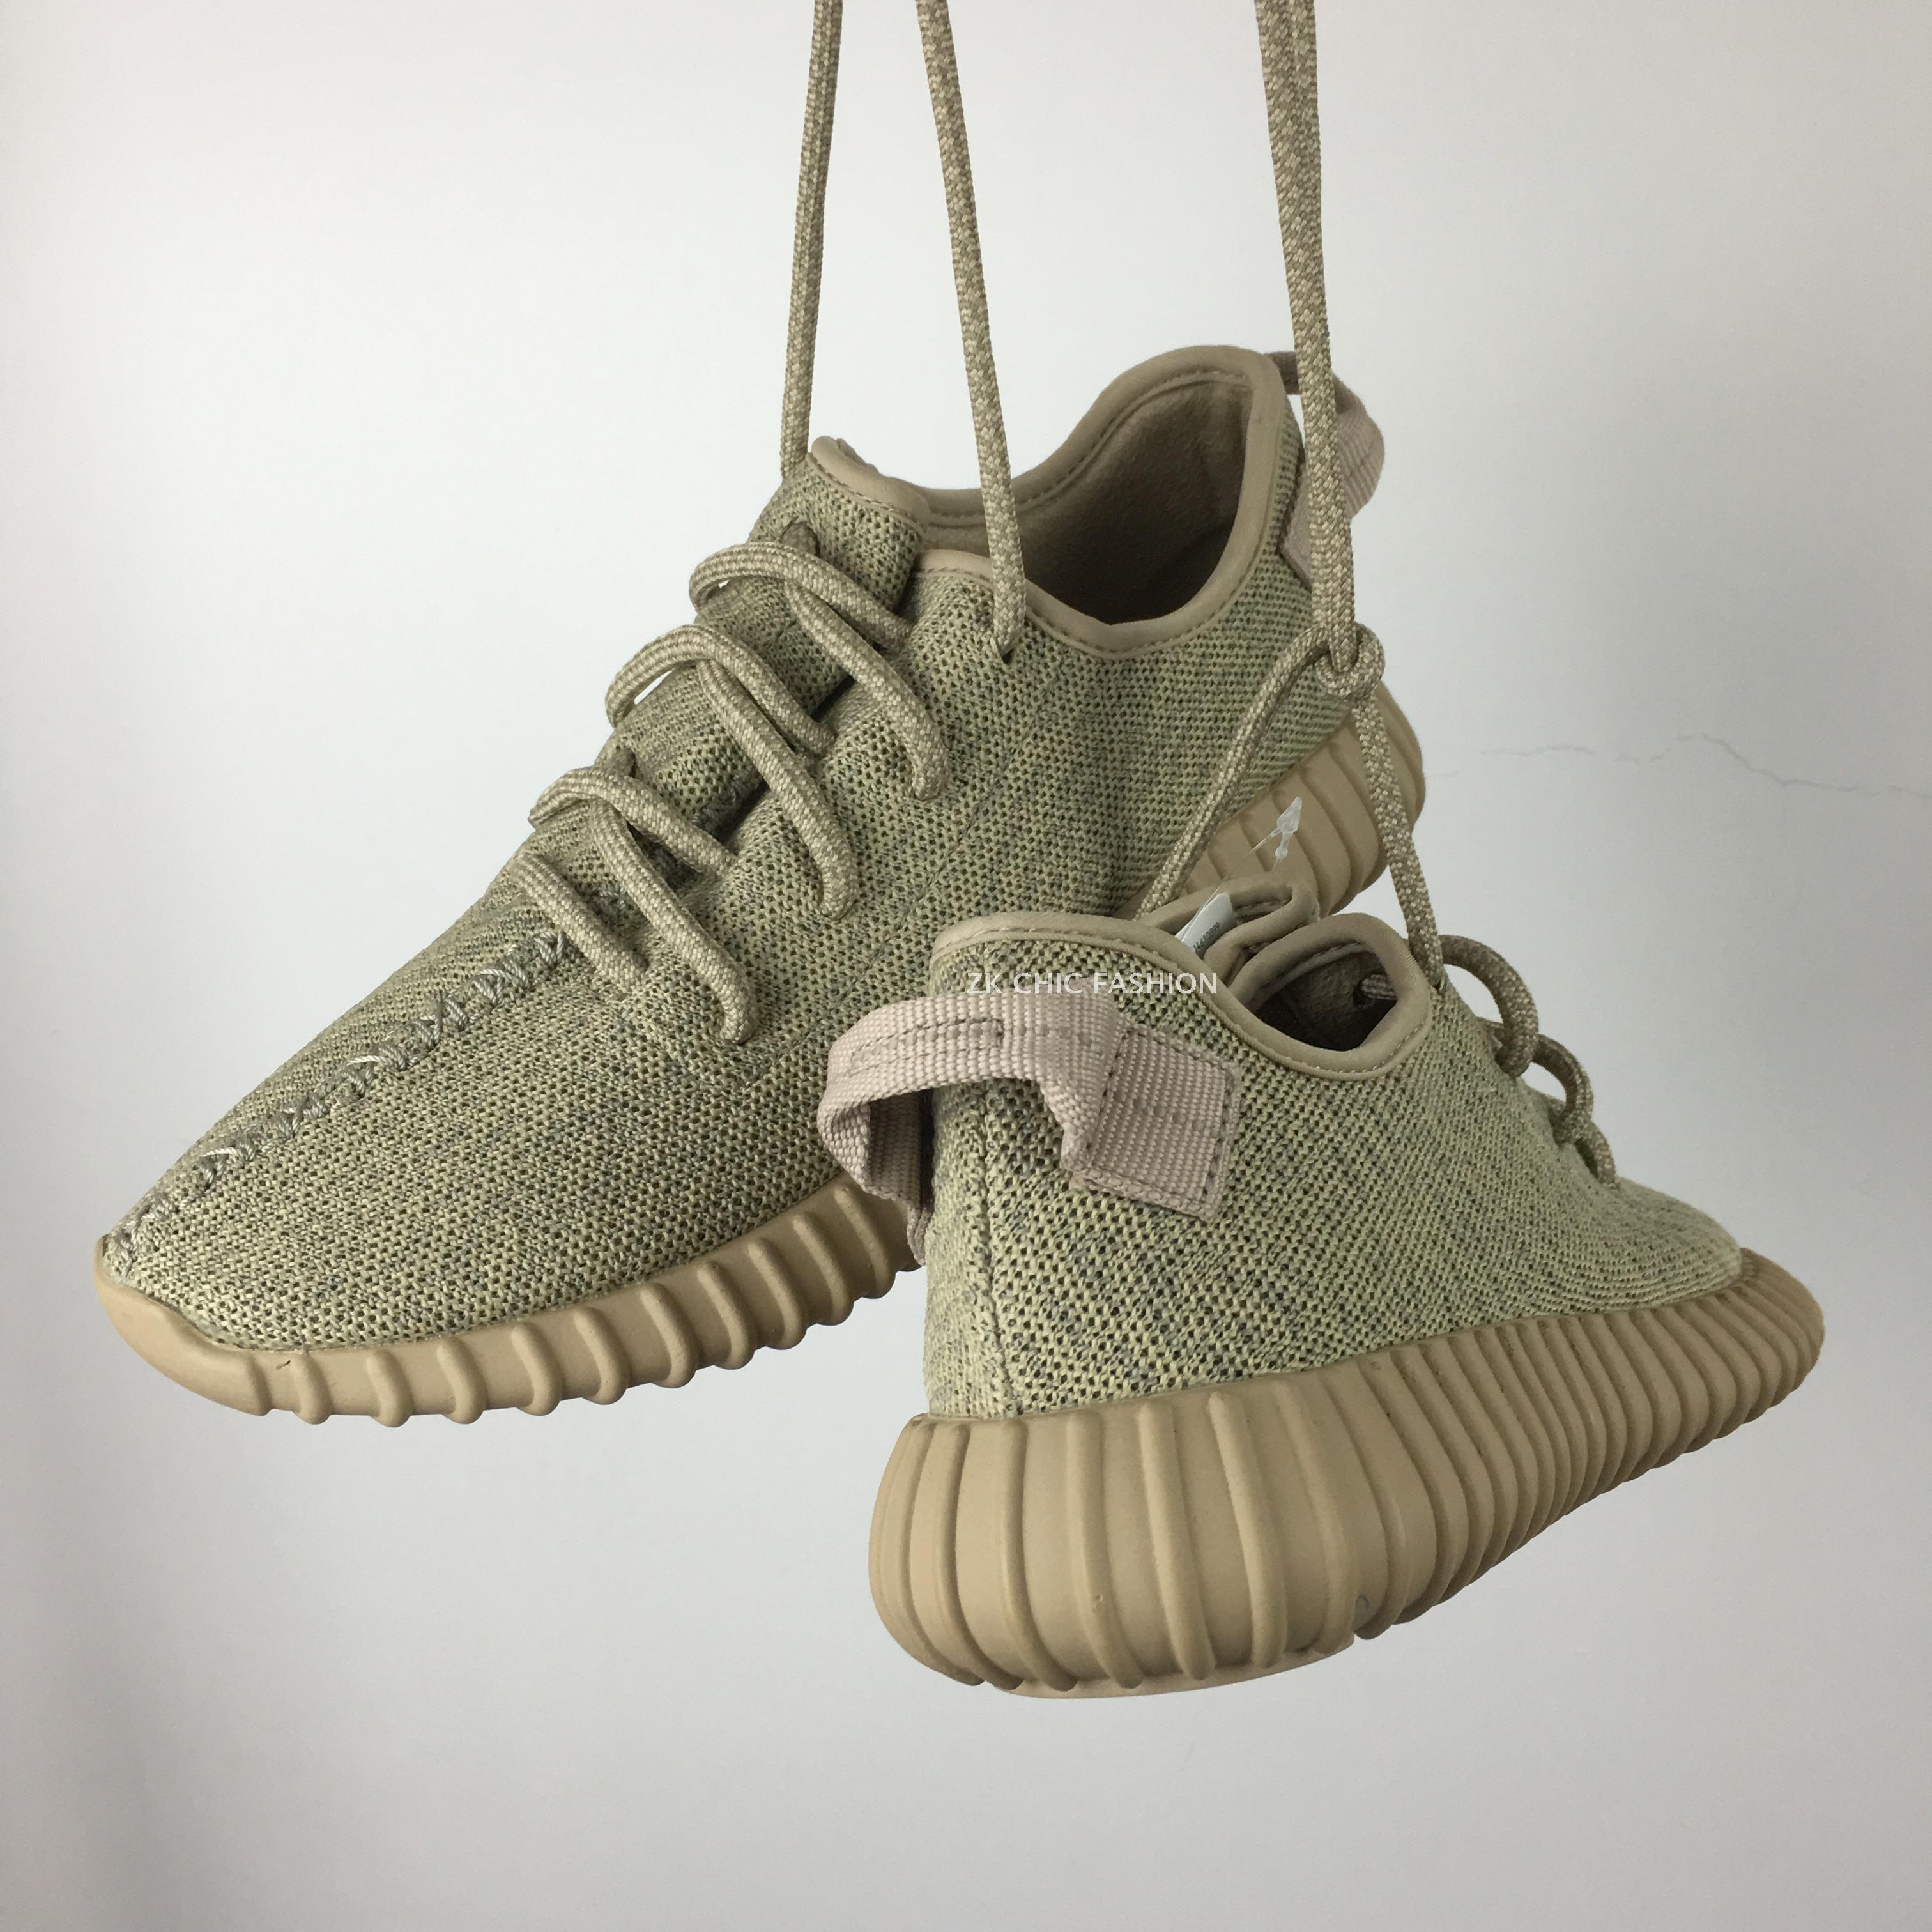 Adidas Yeezy Oxford Tan Kaufen